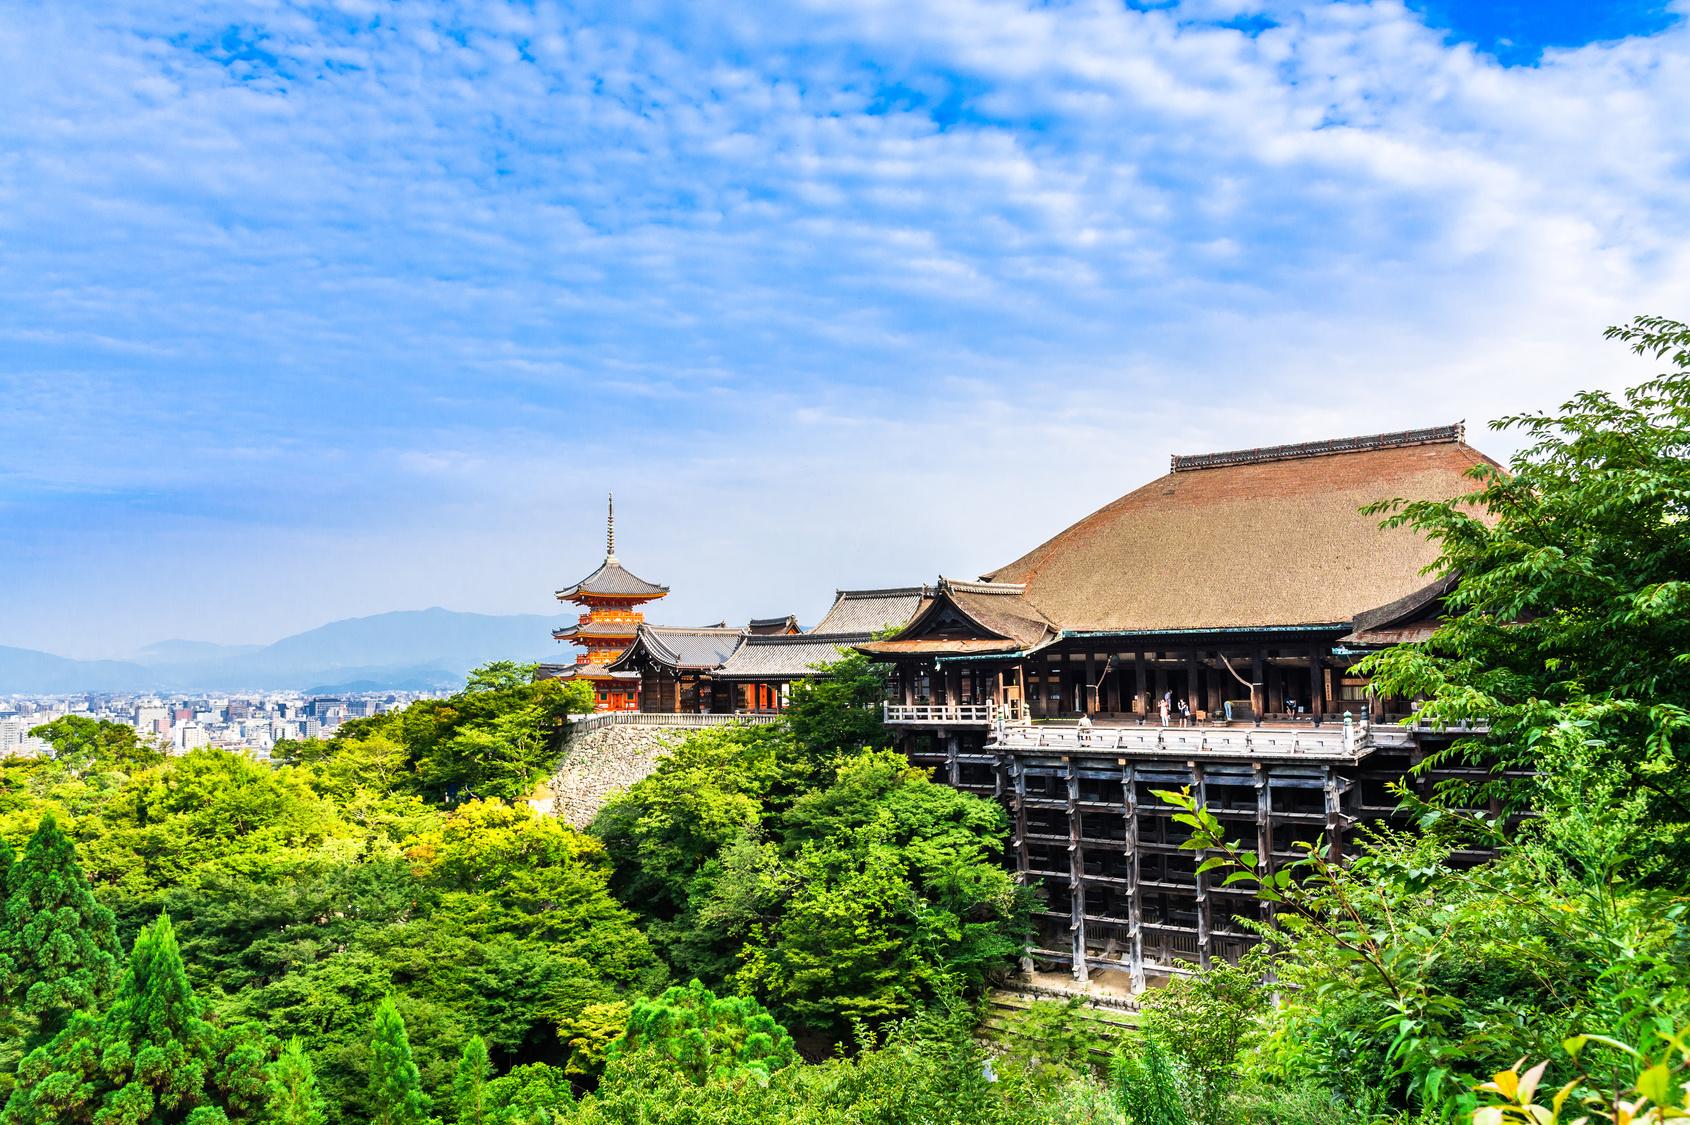 Les 2 capitales avec Hakone